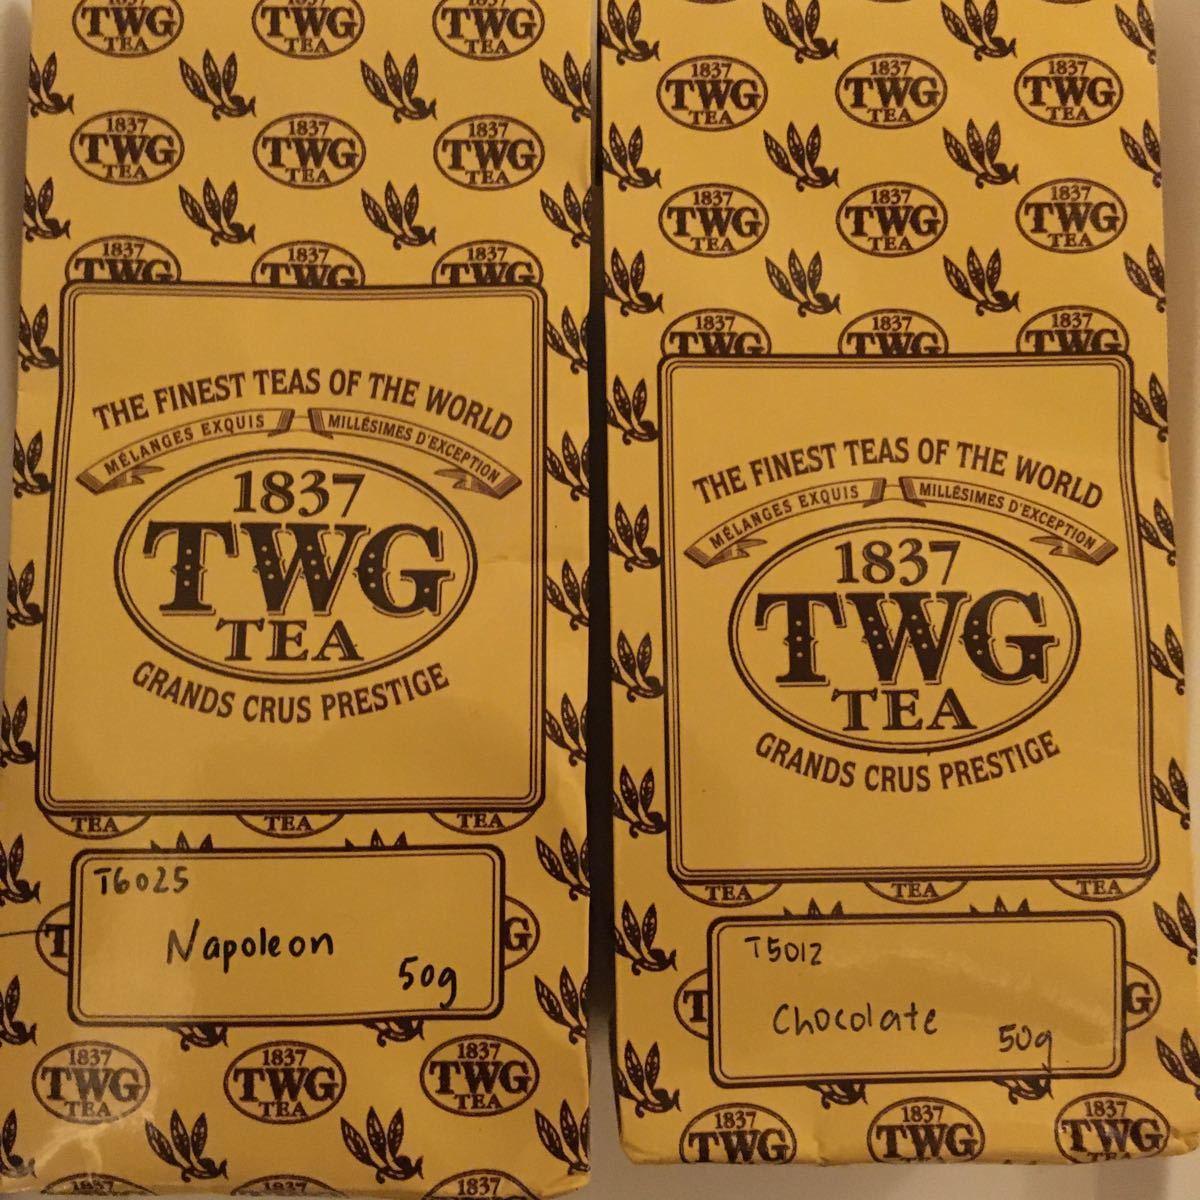 TWG ミルクティーに合う茶葉50g x 2袋 ナポレオンティー&チョコレートティー